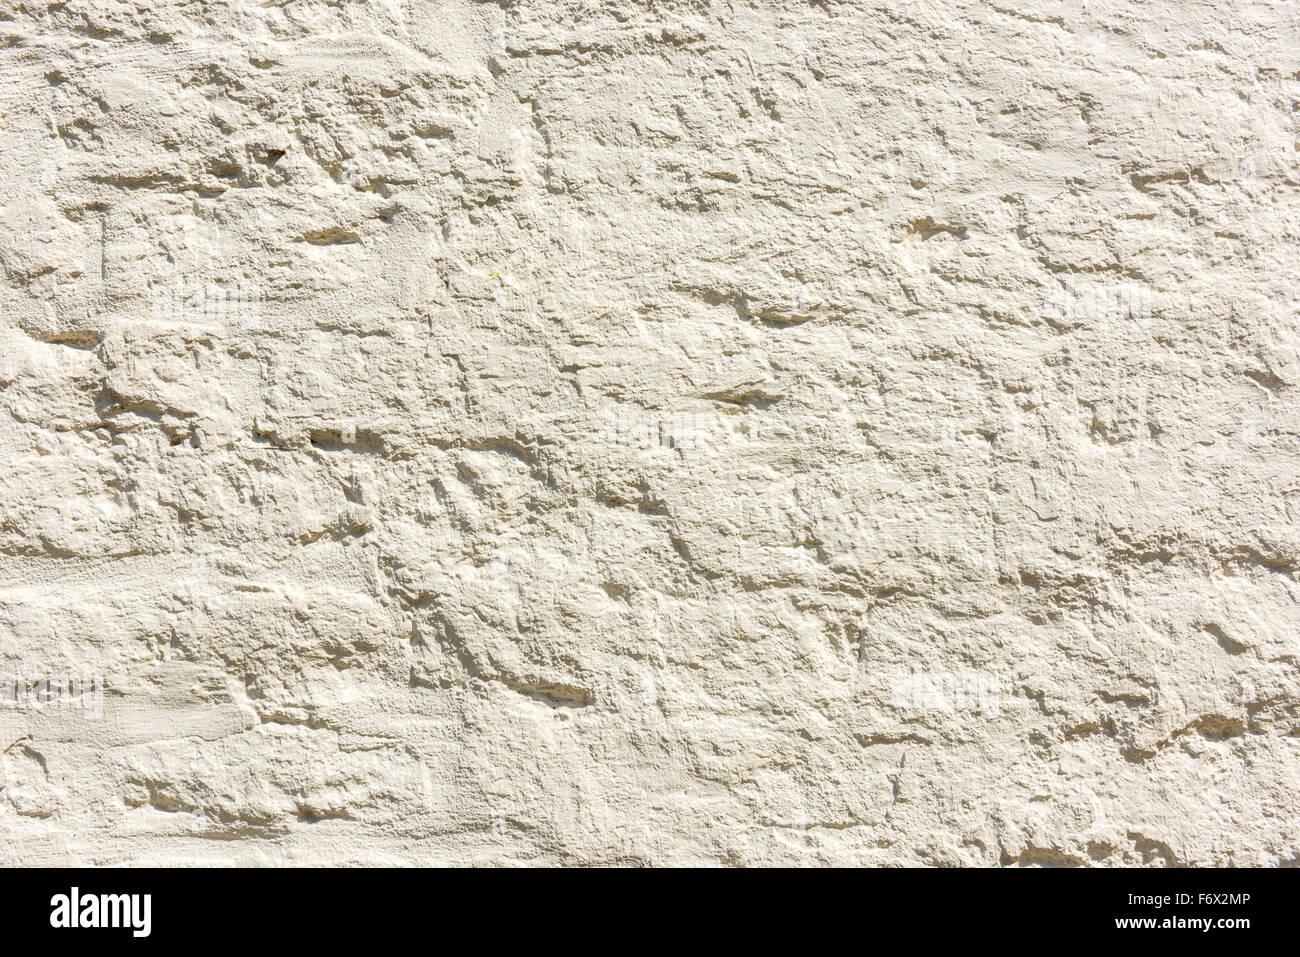 Enchanting Peindre Mur En Platre Gallery Best Image Engine